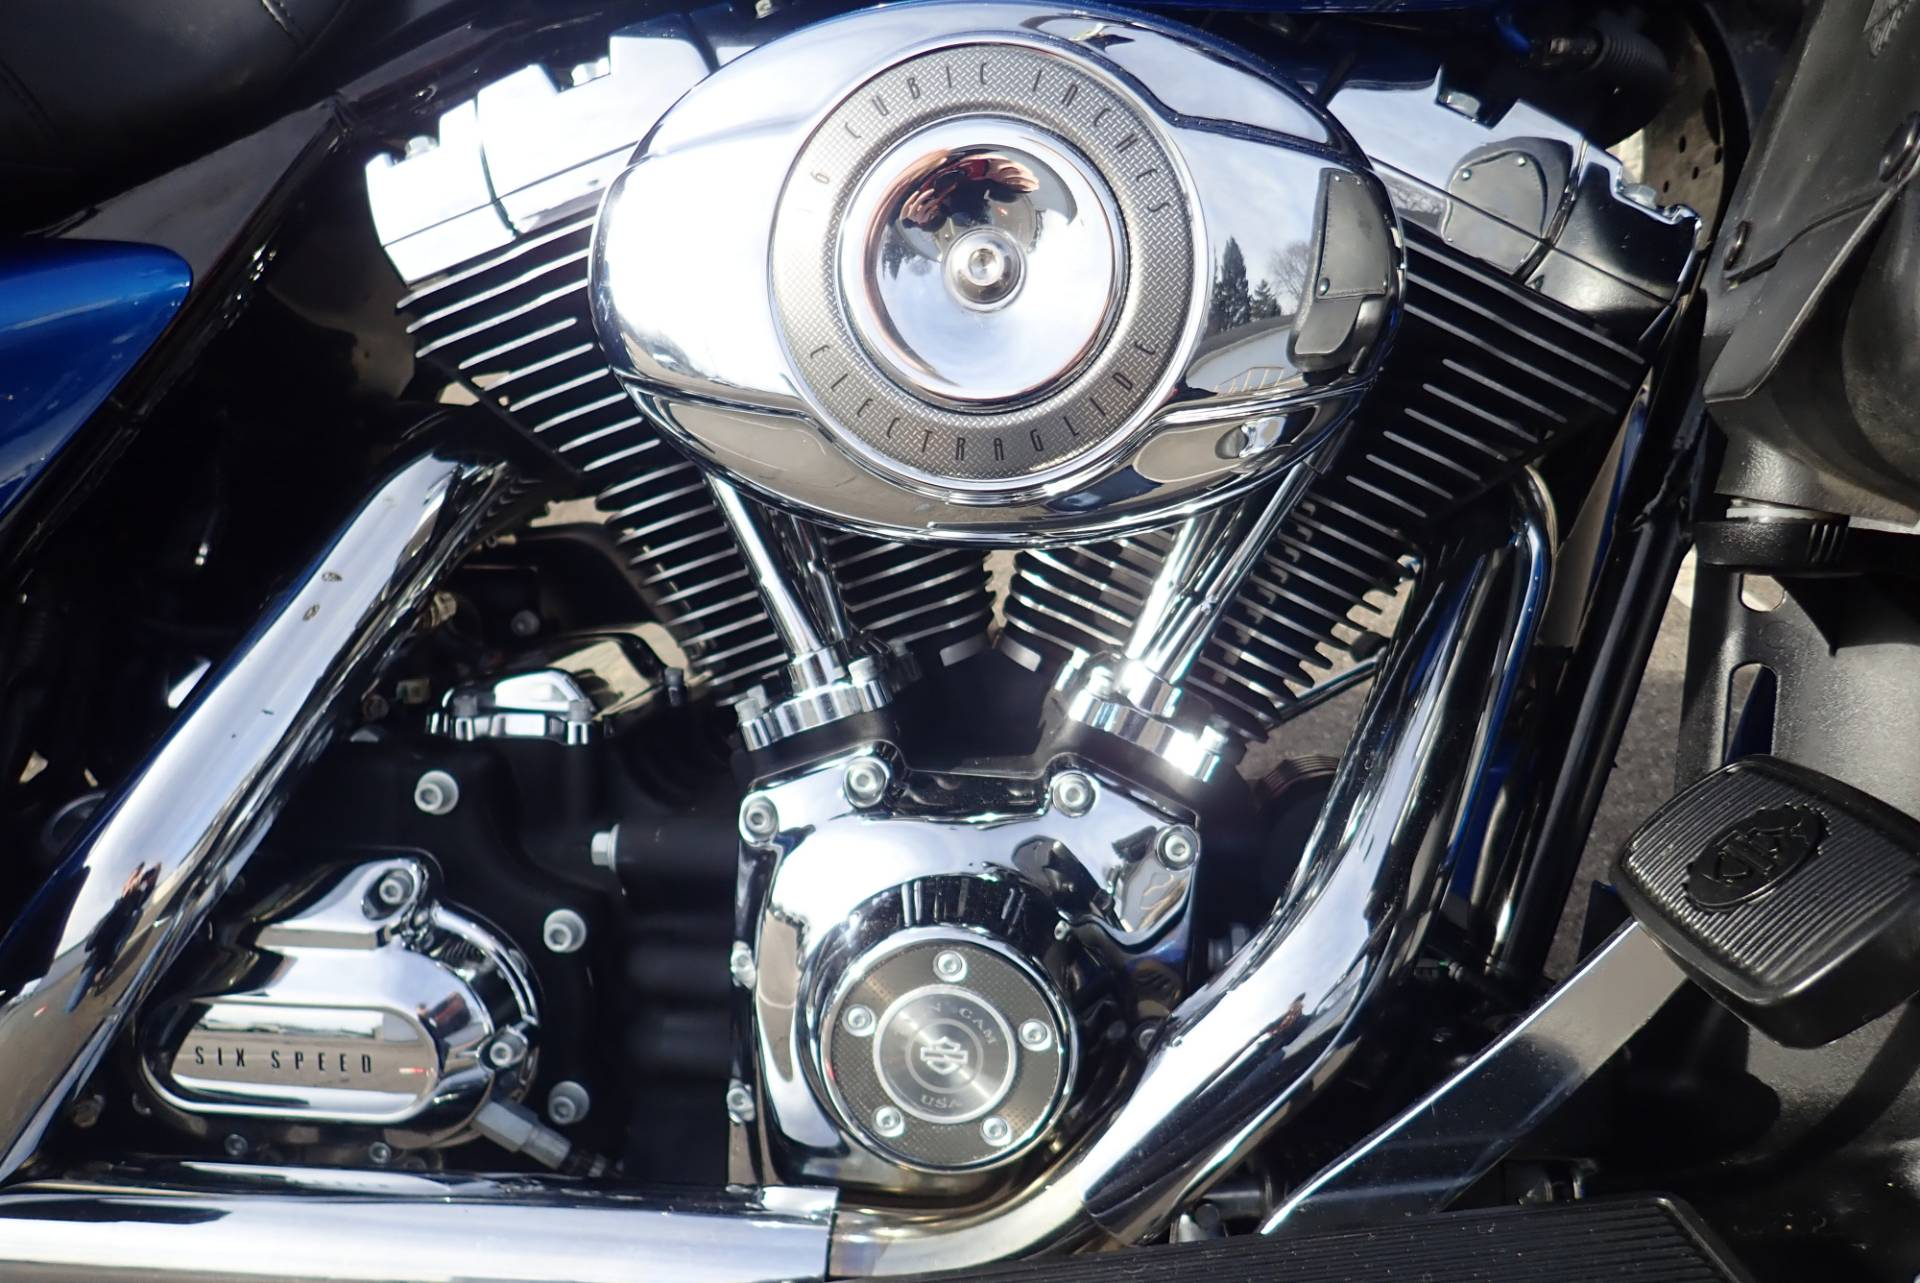 2007 Harley-Davidson Ultra Classic Electra Glide 4